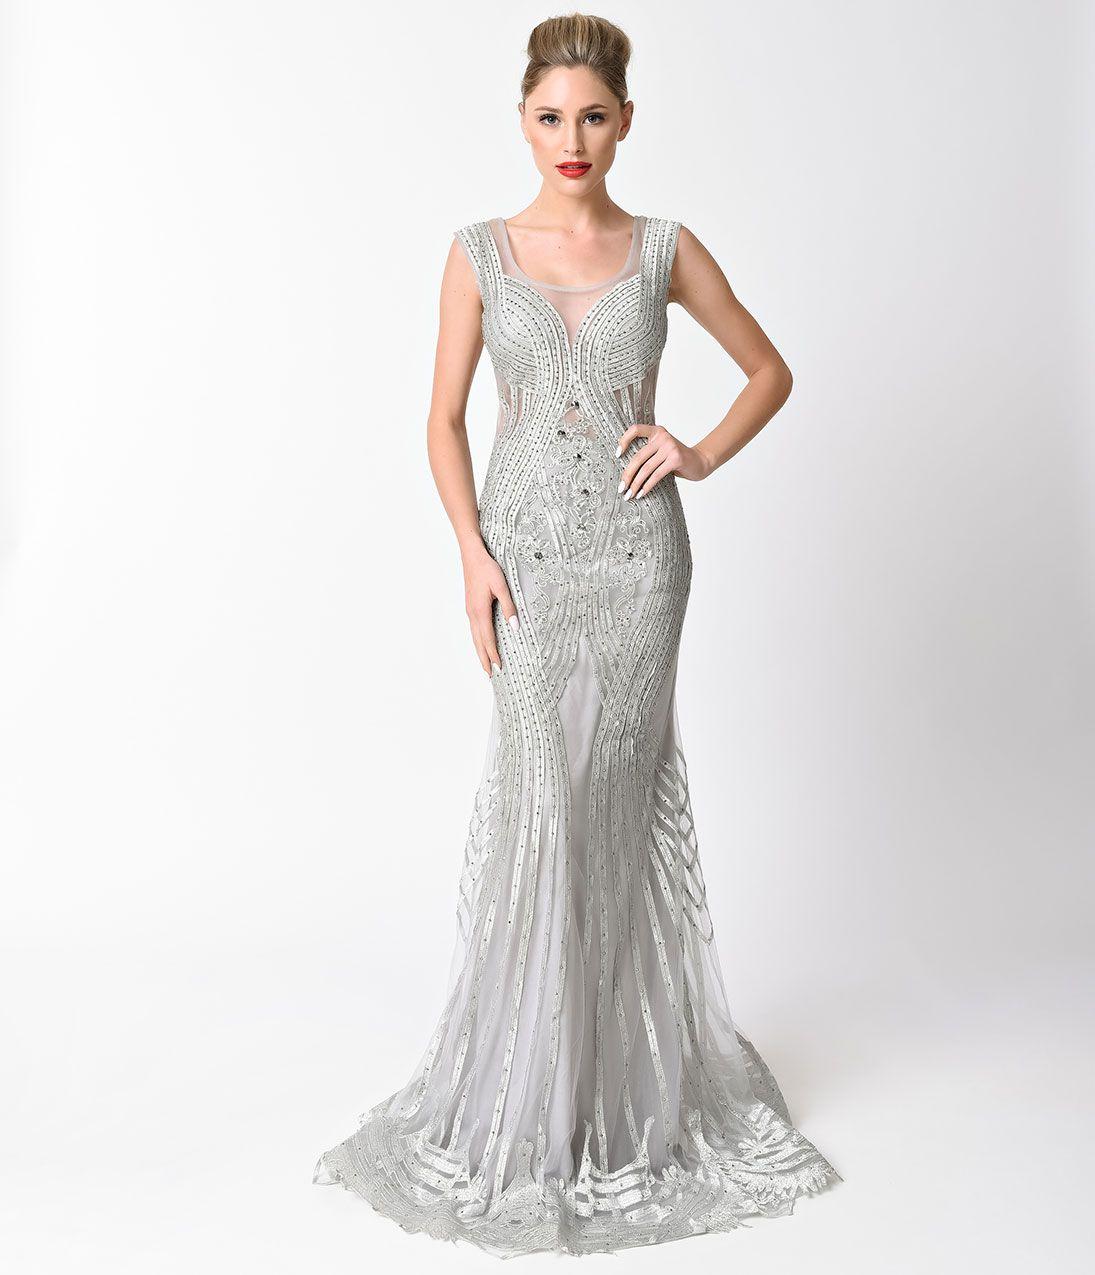 BrandDesigner May Queen Season Occasion Prom Dress